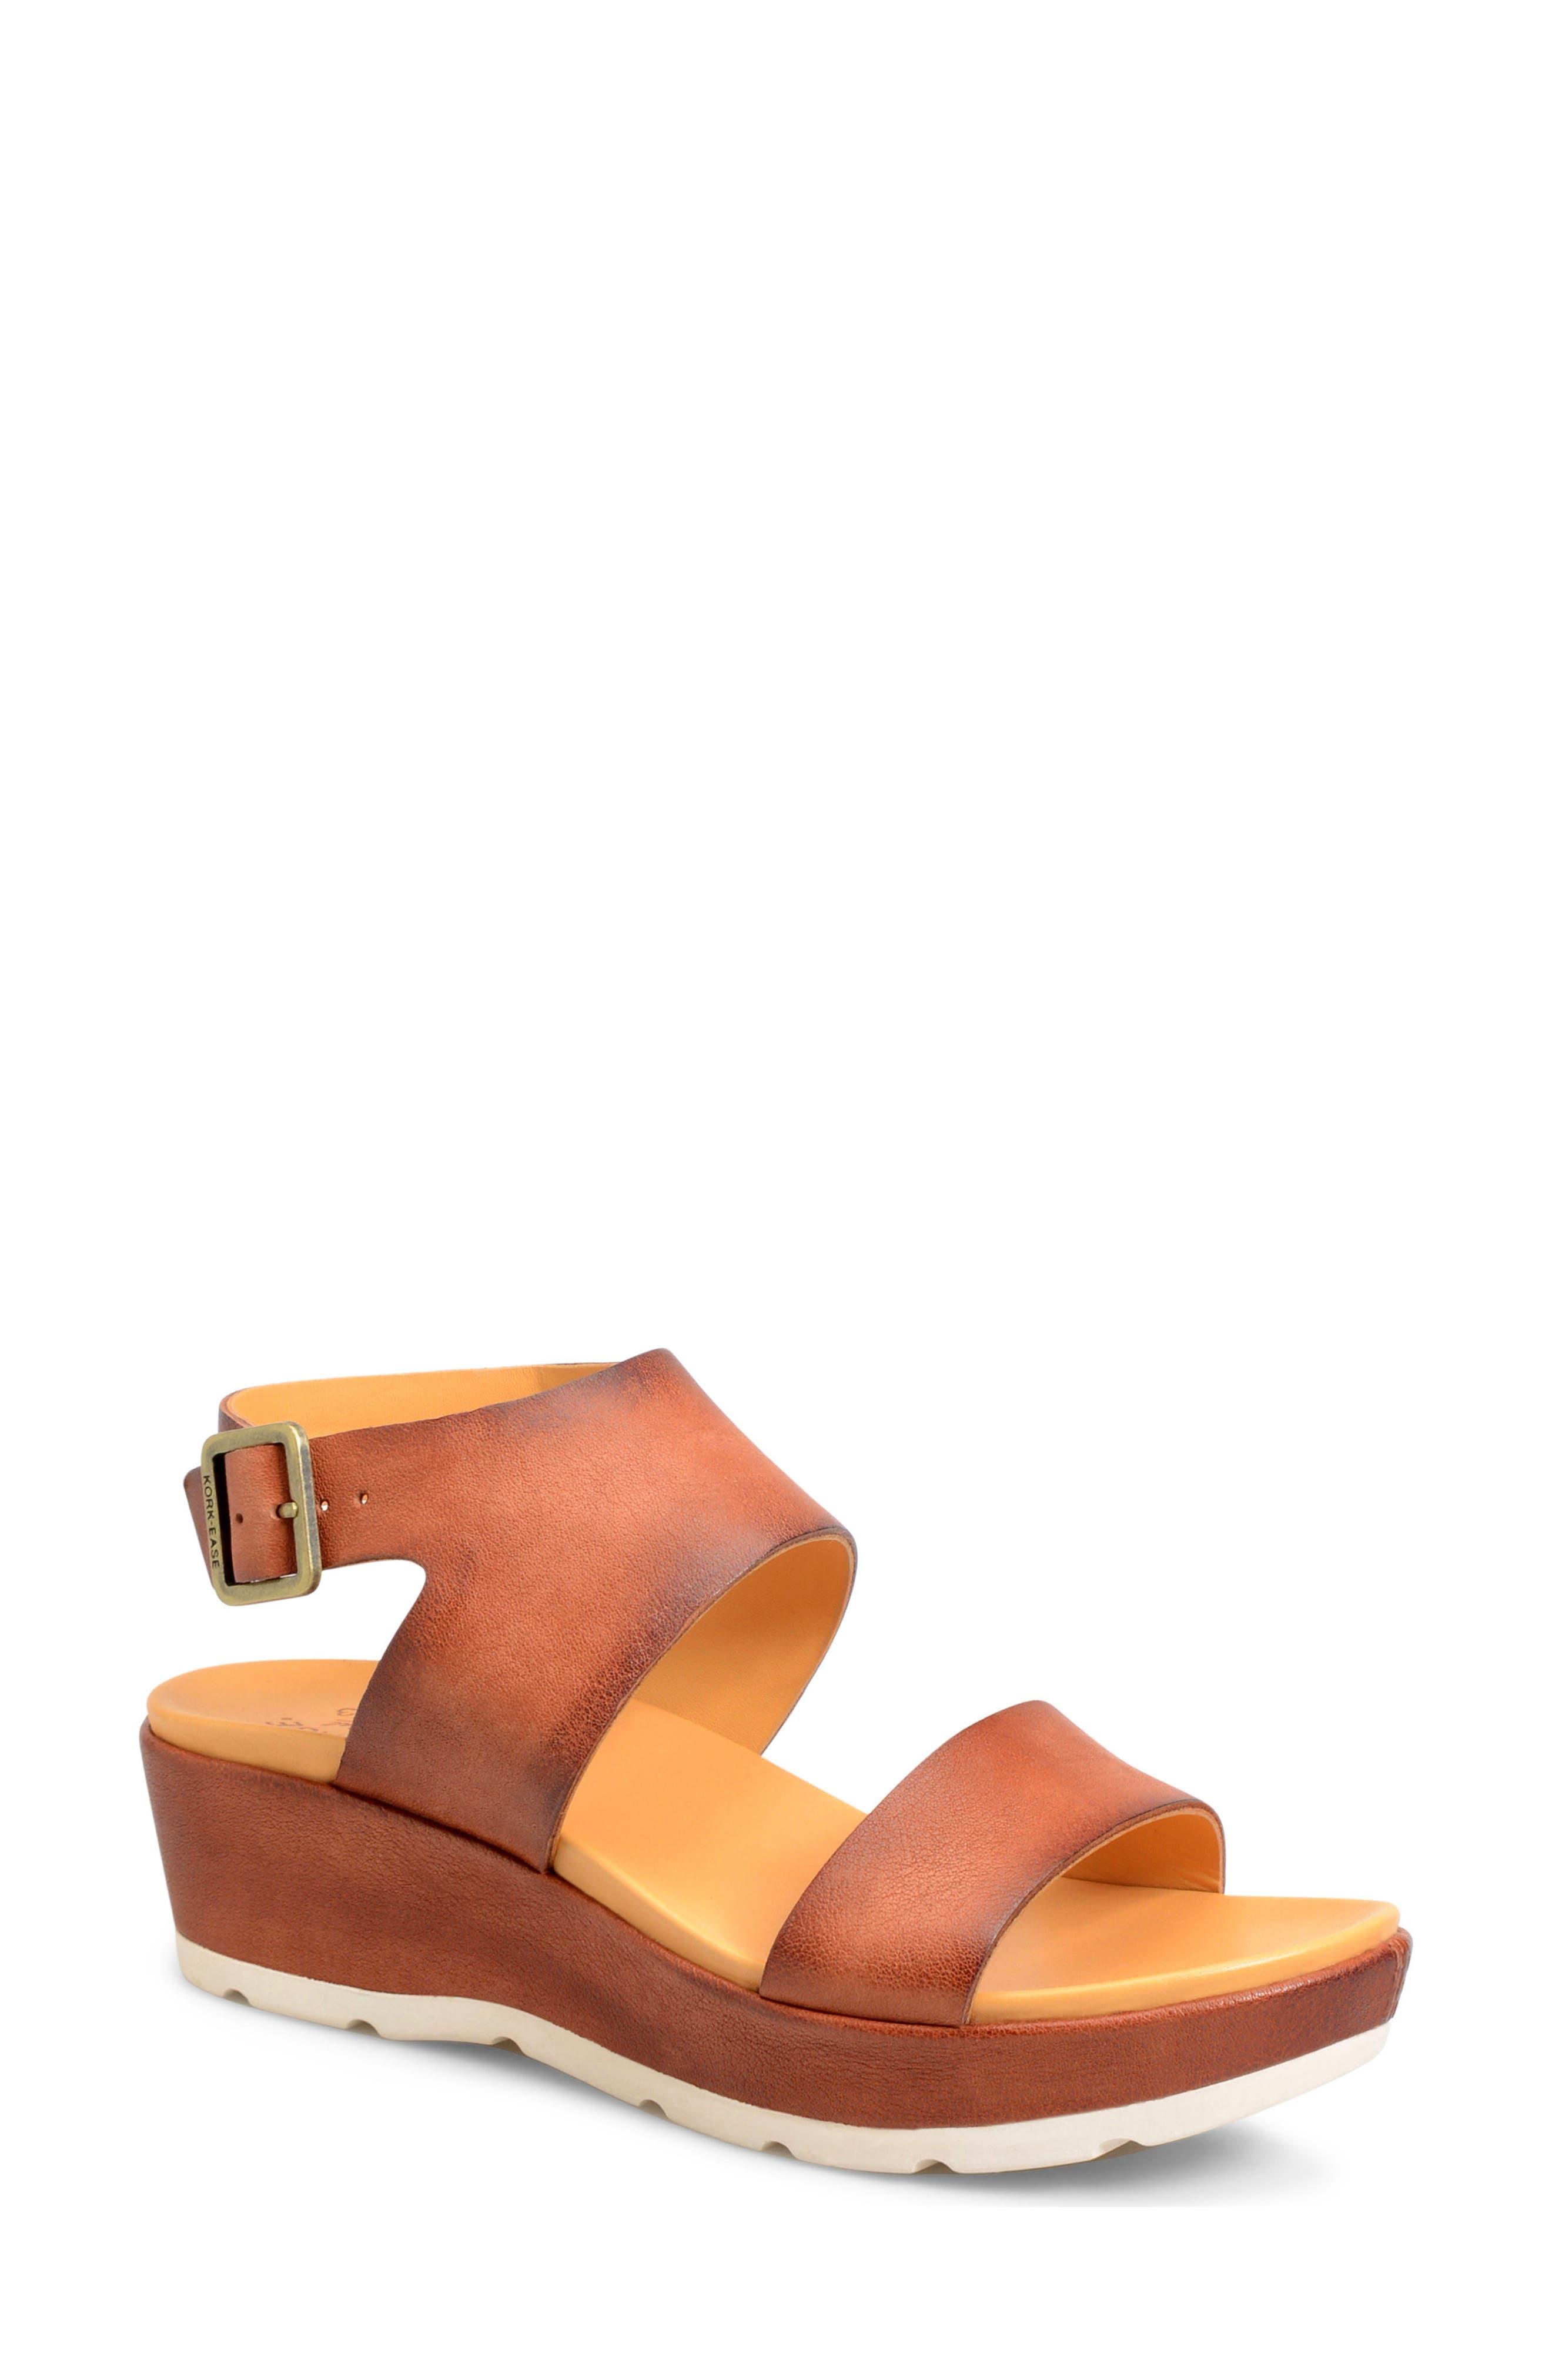 'Khloe' Platform Wedge Sandal,                             Main thumbnail 3, color,